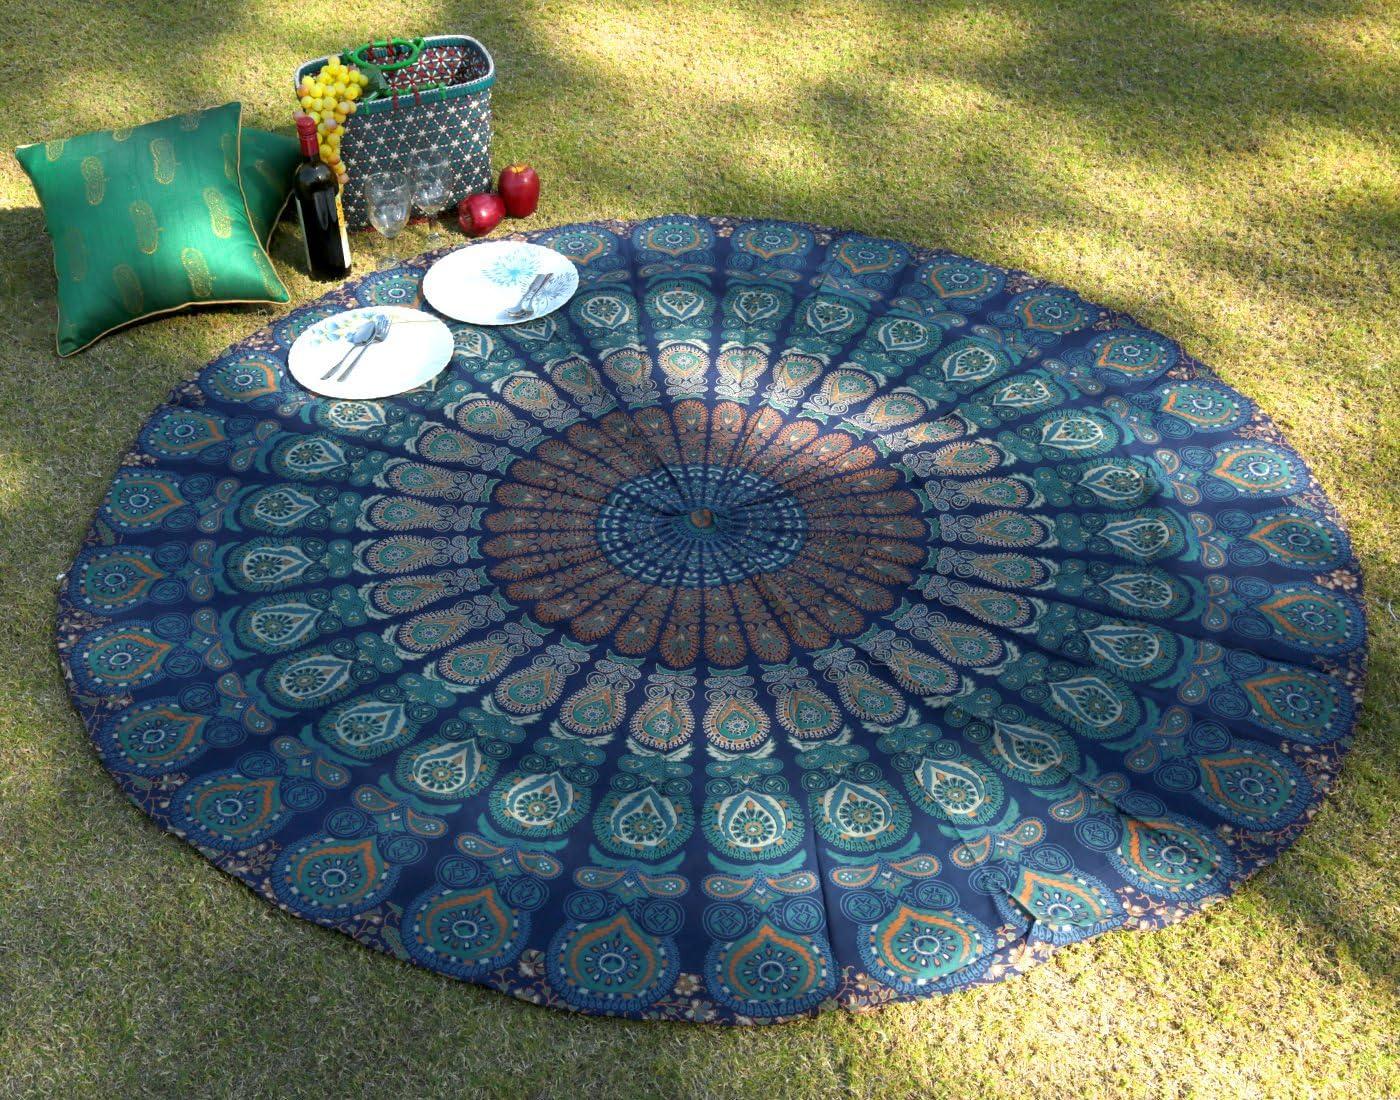 "RAJRANG BRINGING RAJASTHAN TO YOU Mandala Round Tapestry - Hippie Boho Home Decor Cotton Tablecloth Picnic Camping Beach Throw Roundie Towel - Blue - 72"""